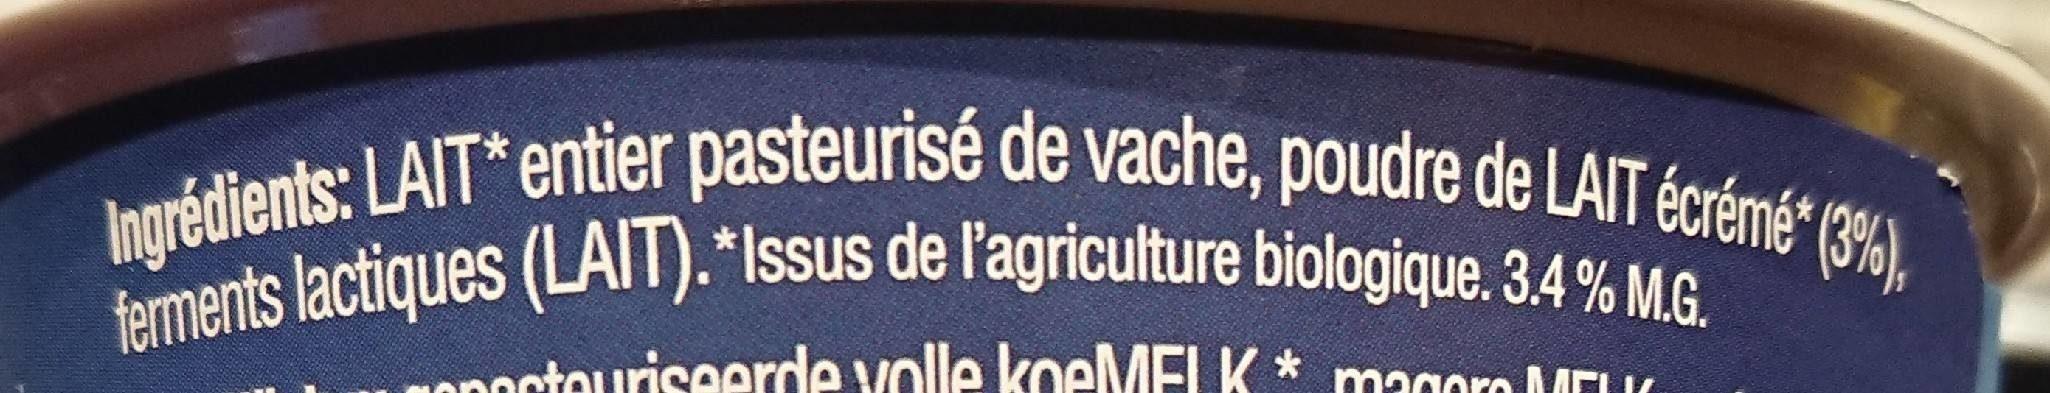 Yaourt artisanal biologique - Ingredients